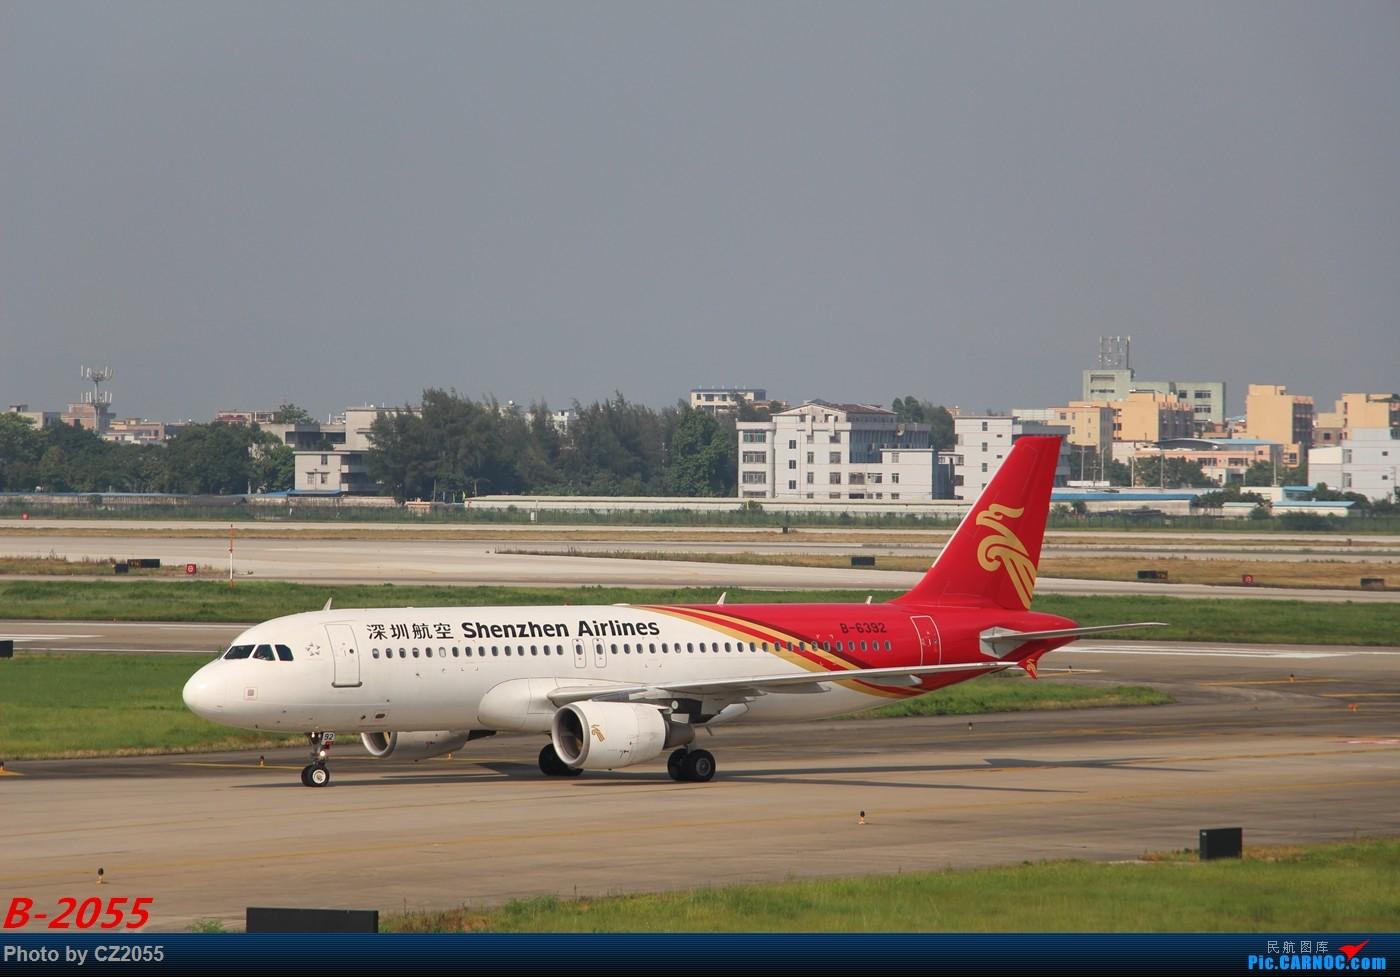 Re:[原创]Re:[原创]【广东青少年拍机小队】【C-Z-2055】发完737和宽体就升级320,那就再发一组320系列。 AIRBUS A320-200 B-6392 中国广州白云国际机场